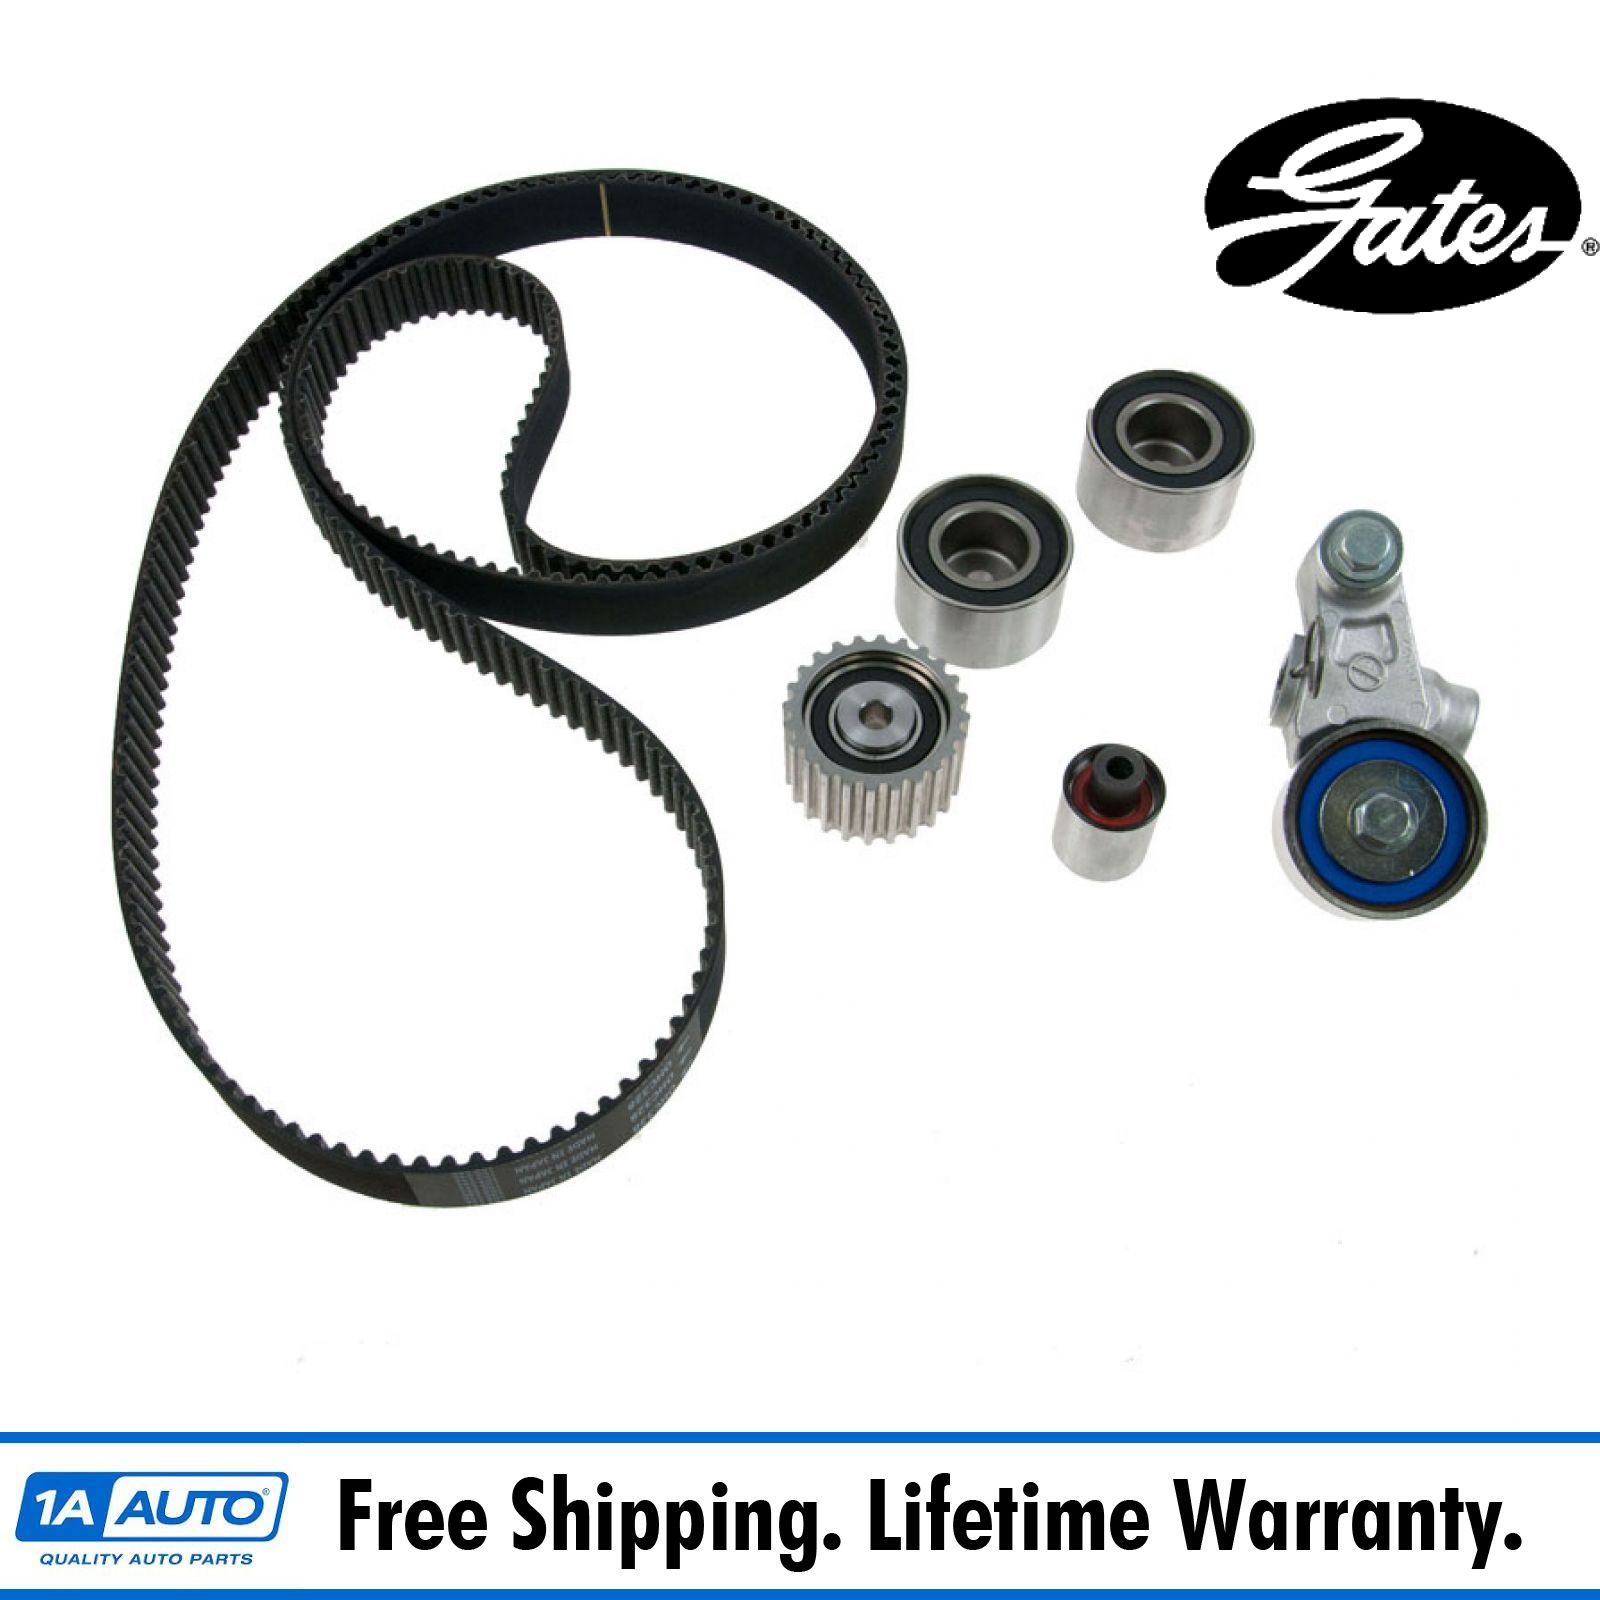 Gates Tck328 Timing Belt Component Kit Set For Subaru 20l 25l 00 Saab 9 5 Turbo